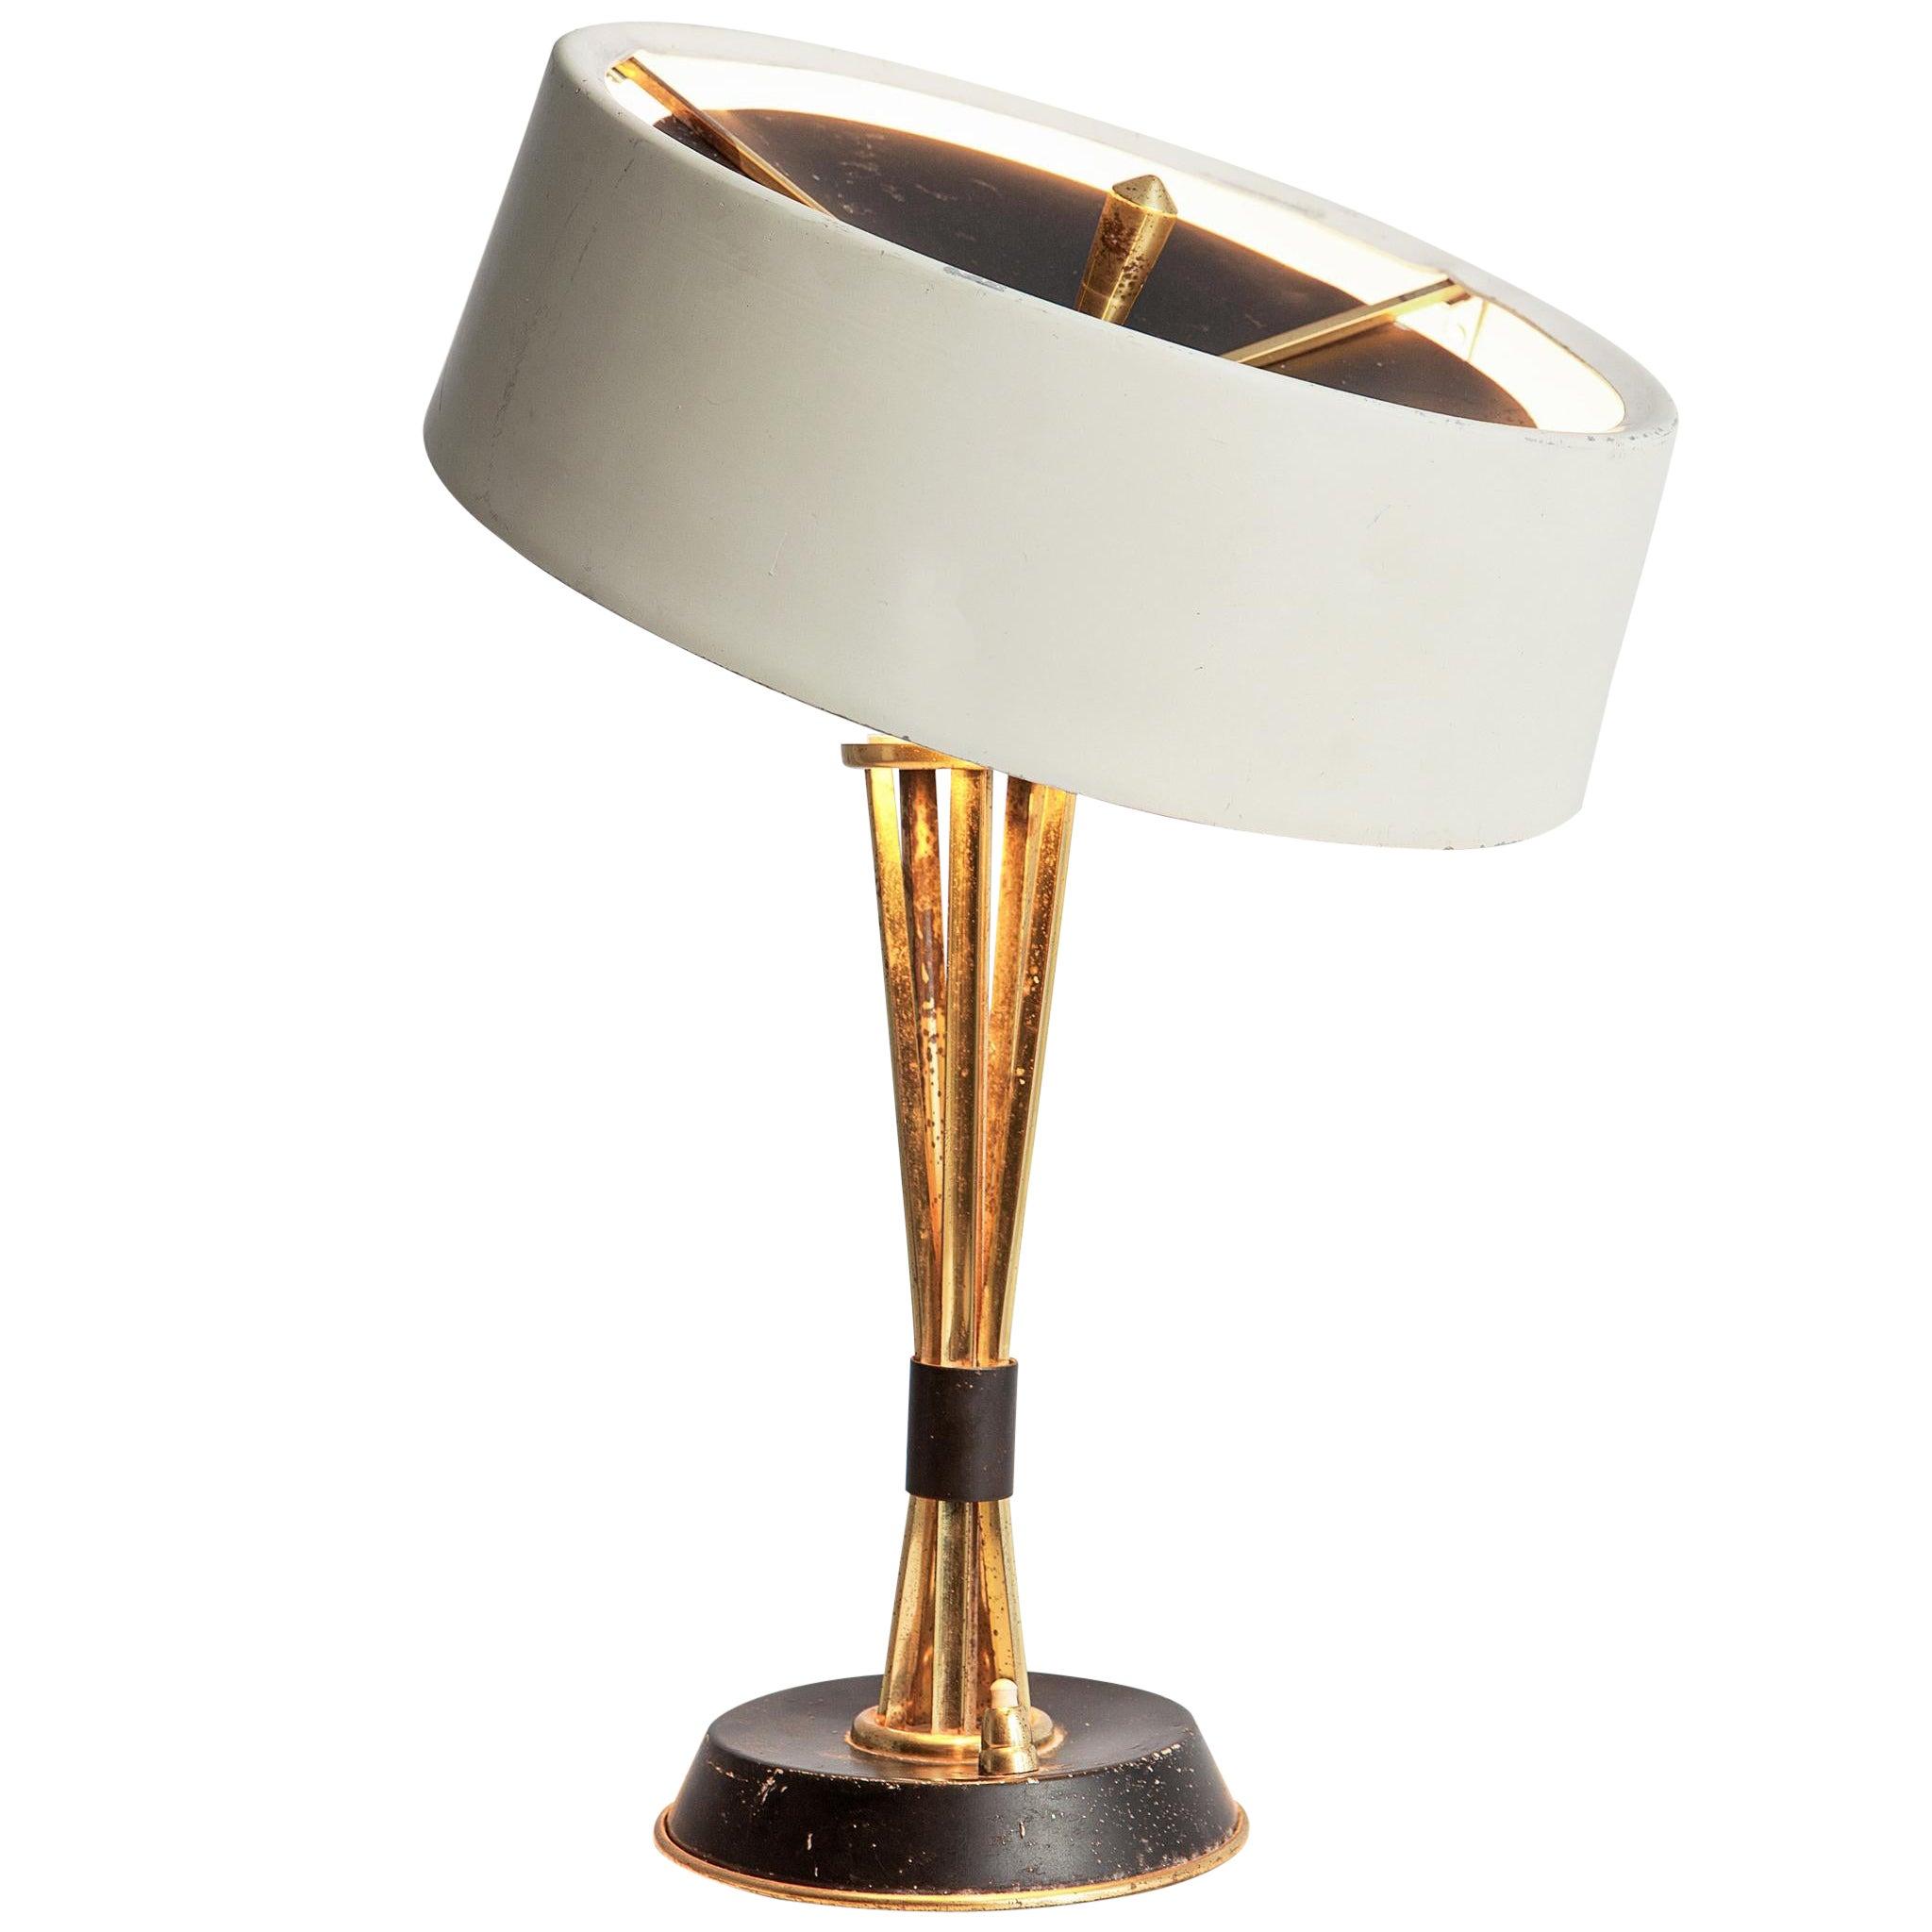 Oscar Torlasco for Lumi Milano Swiveling Table Lamp